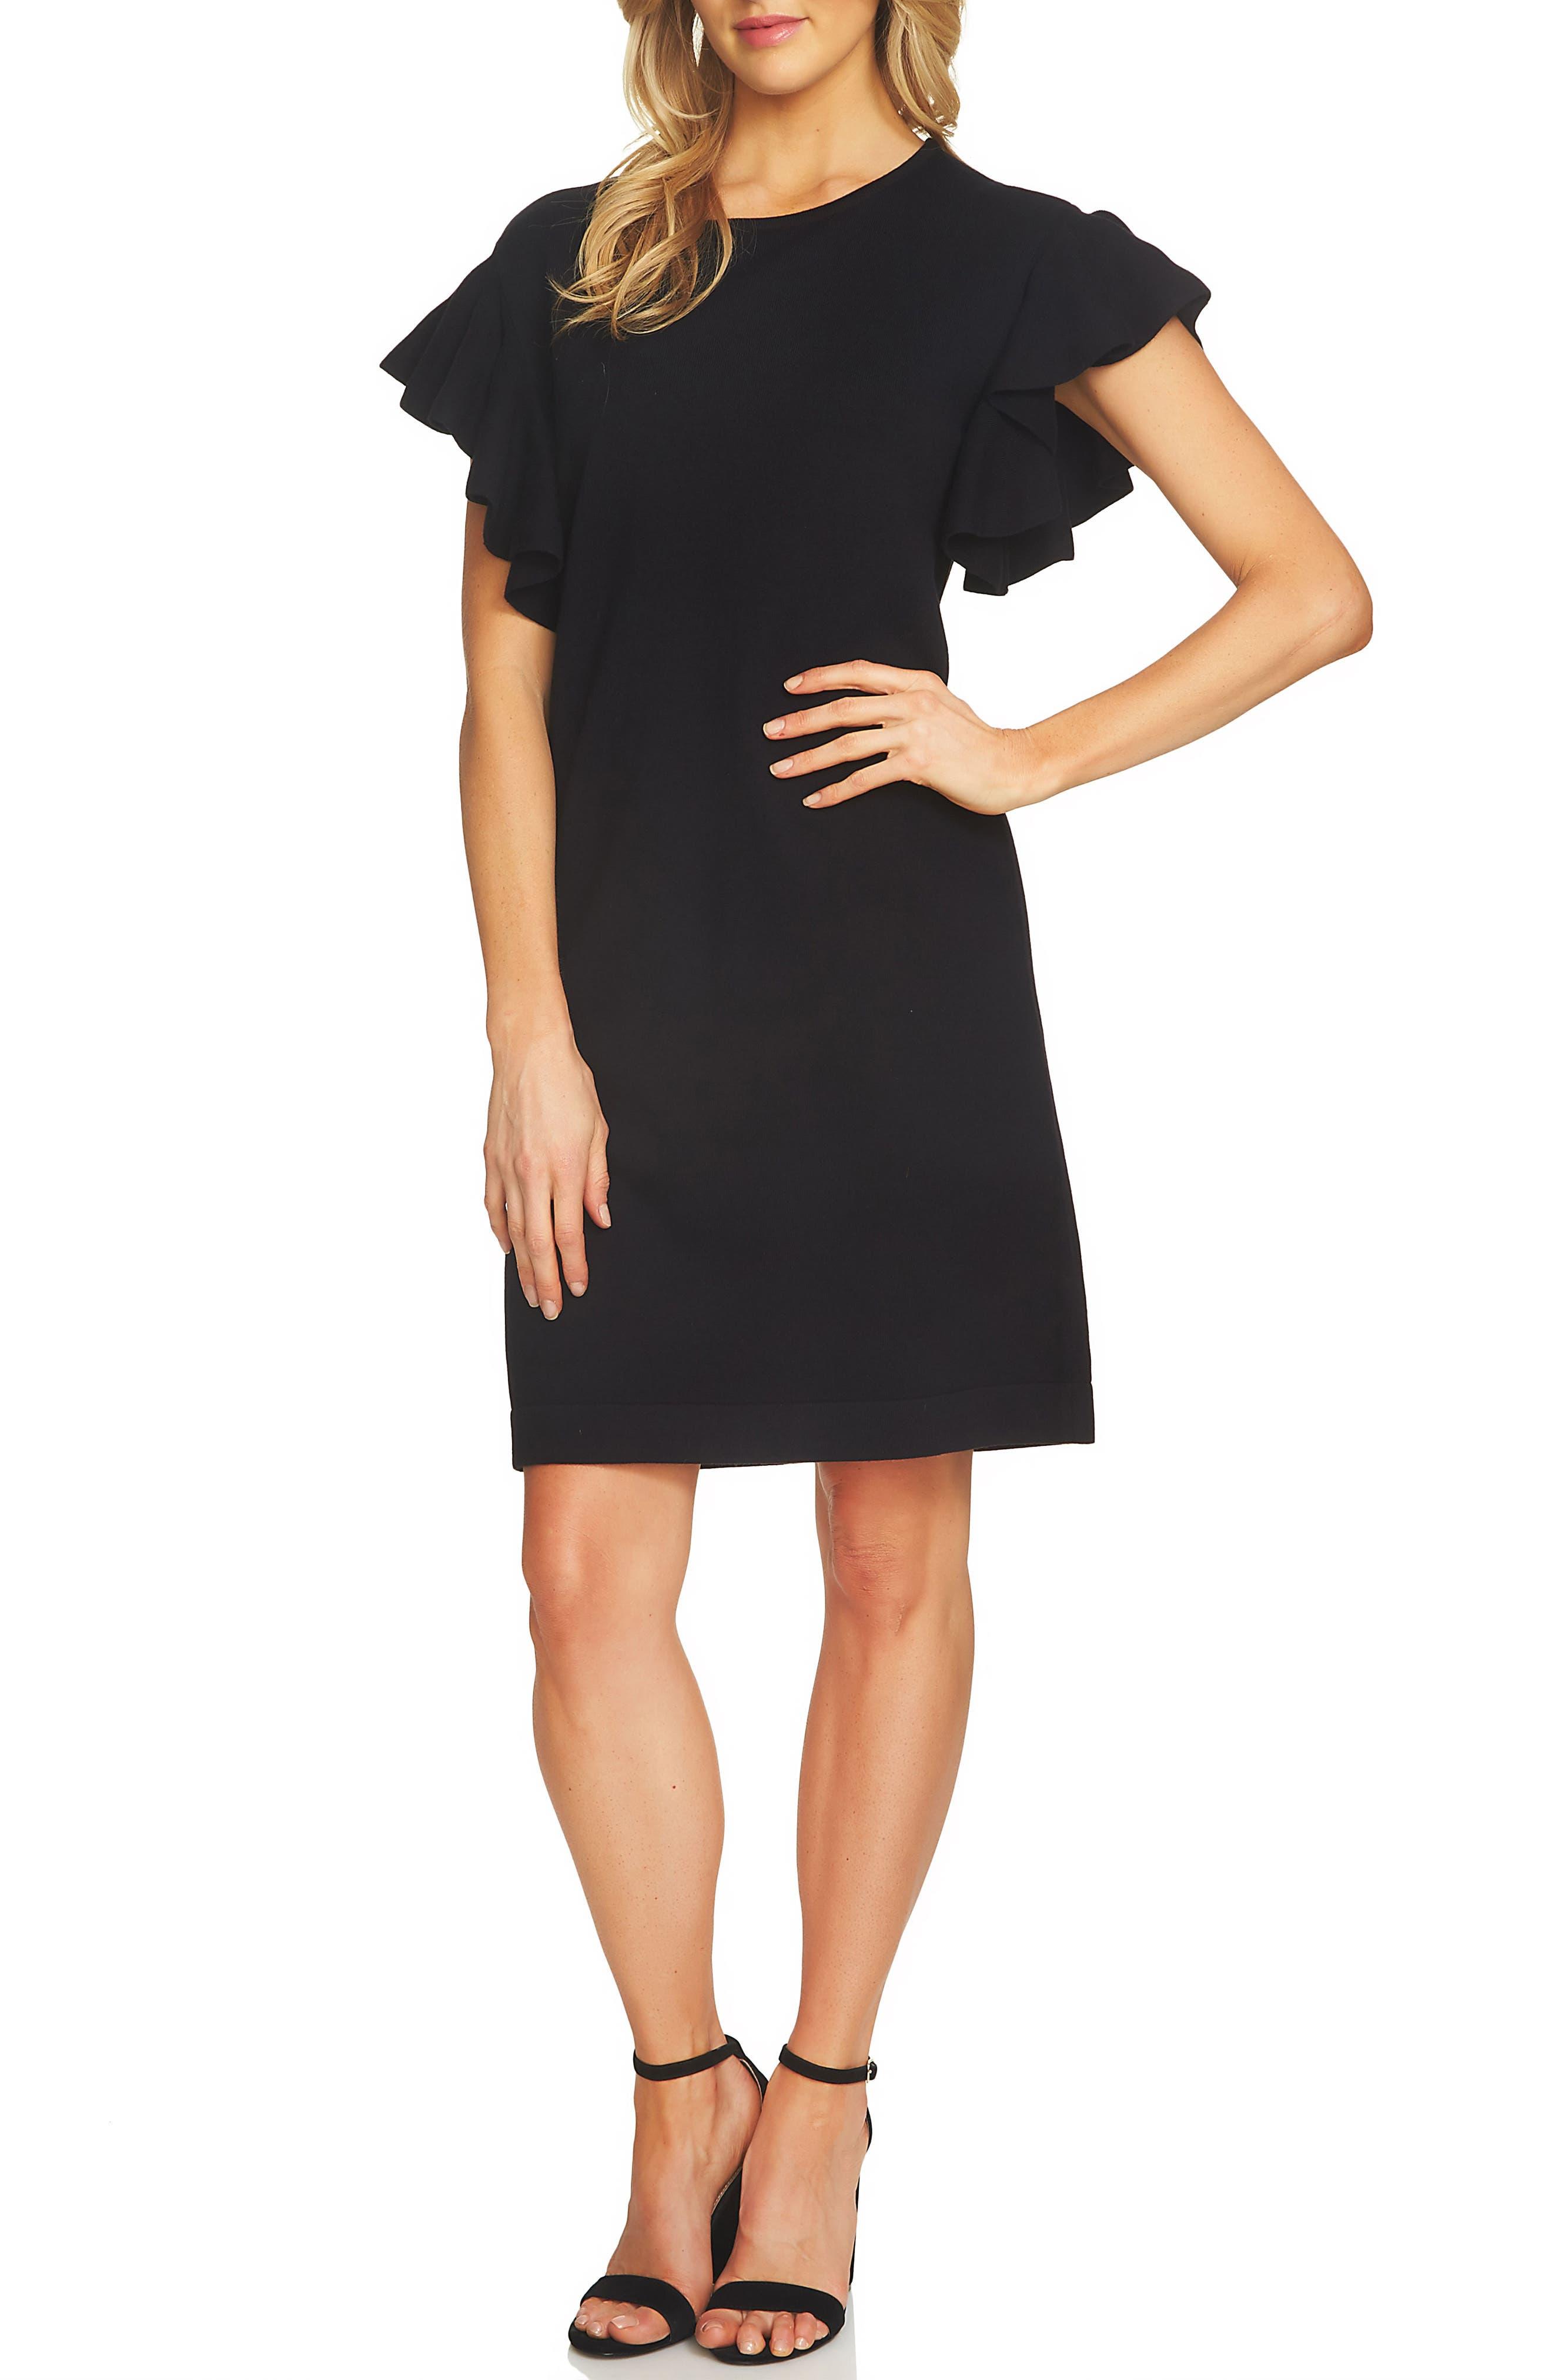 K michelle black dress ralph